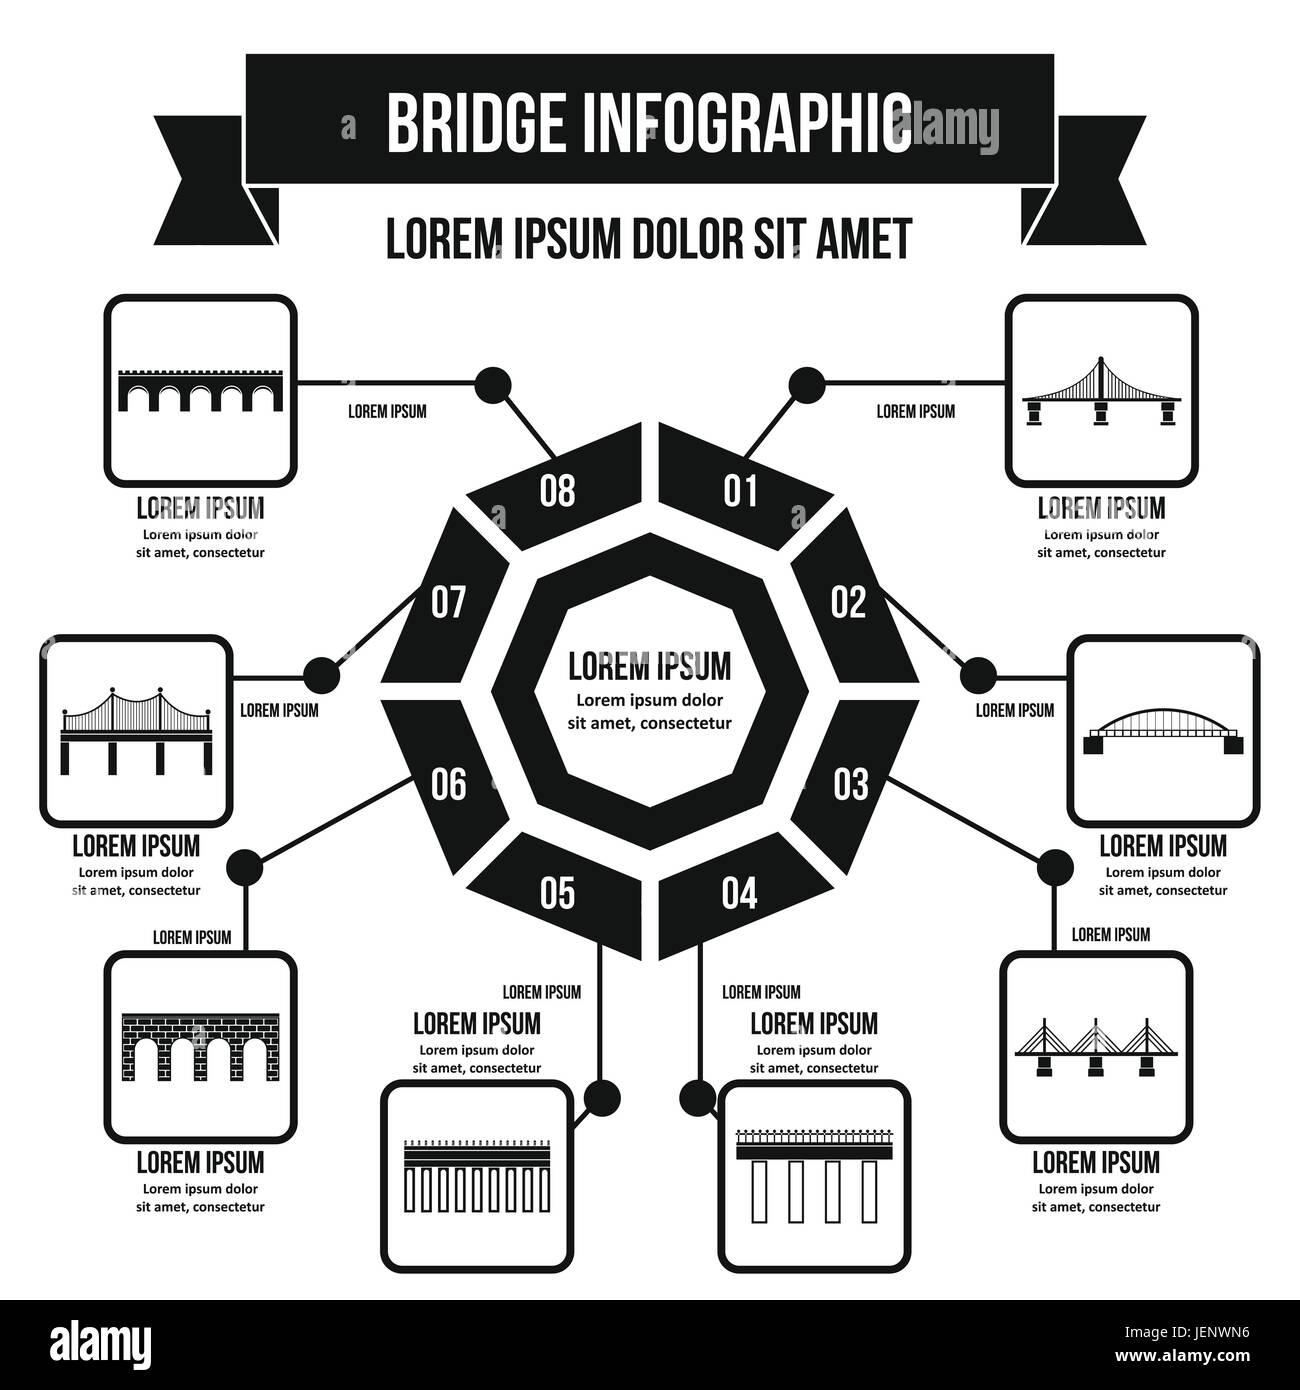 Simple Beam Bridge Stock Photos Images Diagram Infographic Concept Style Image